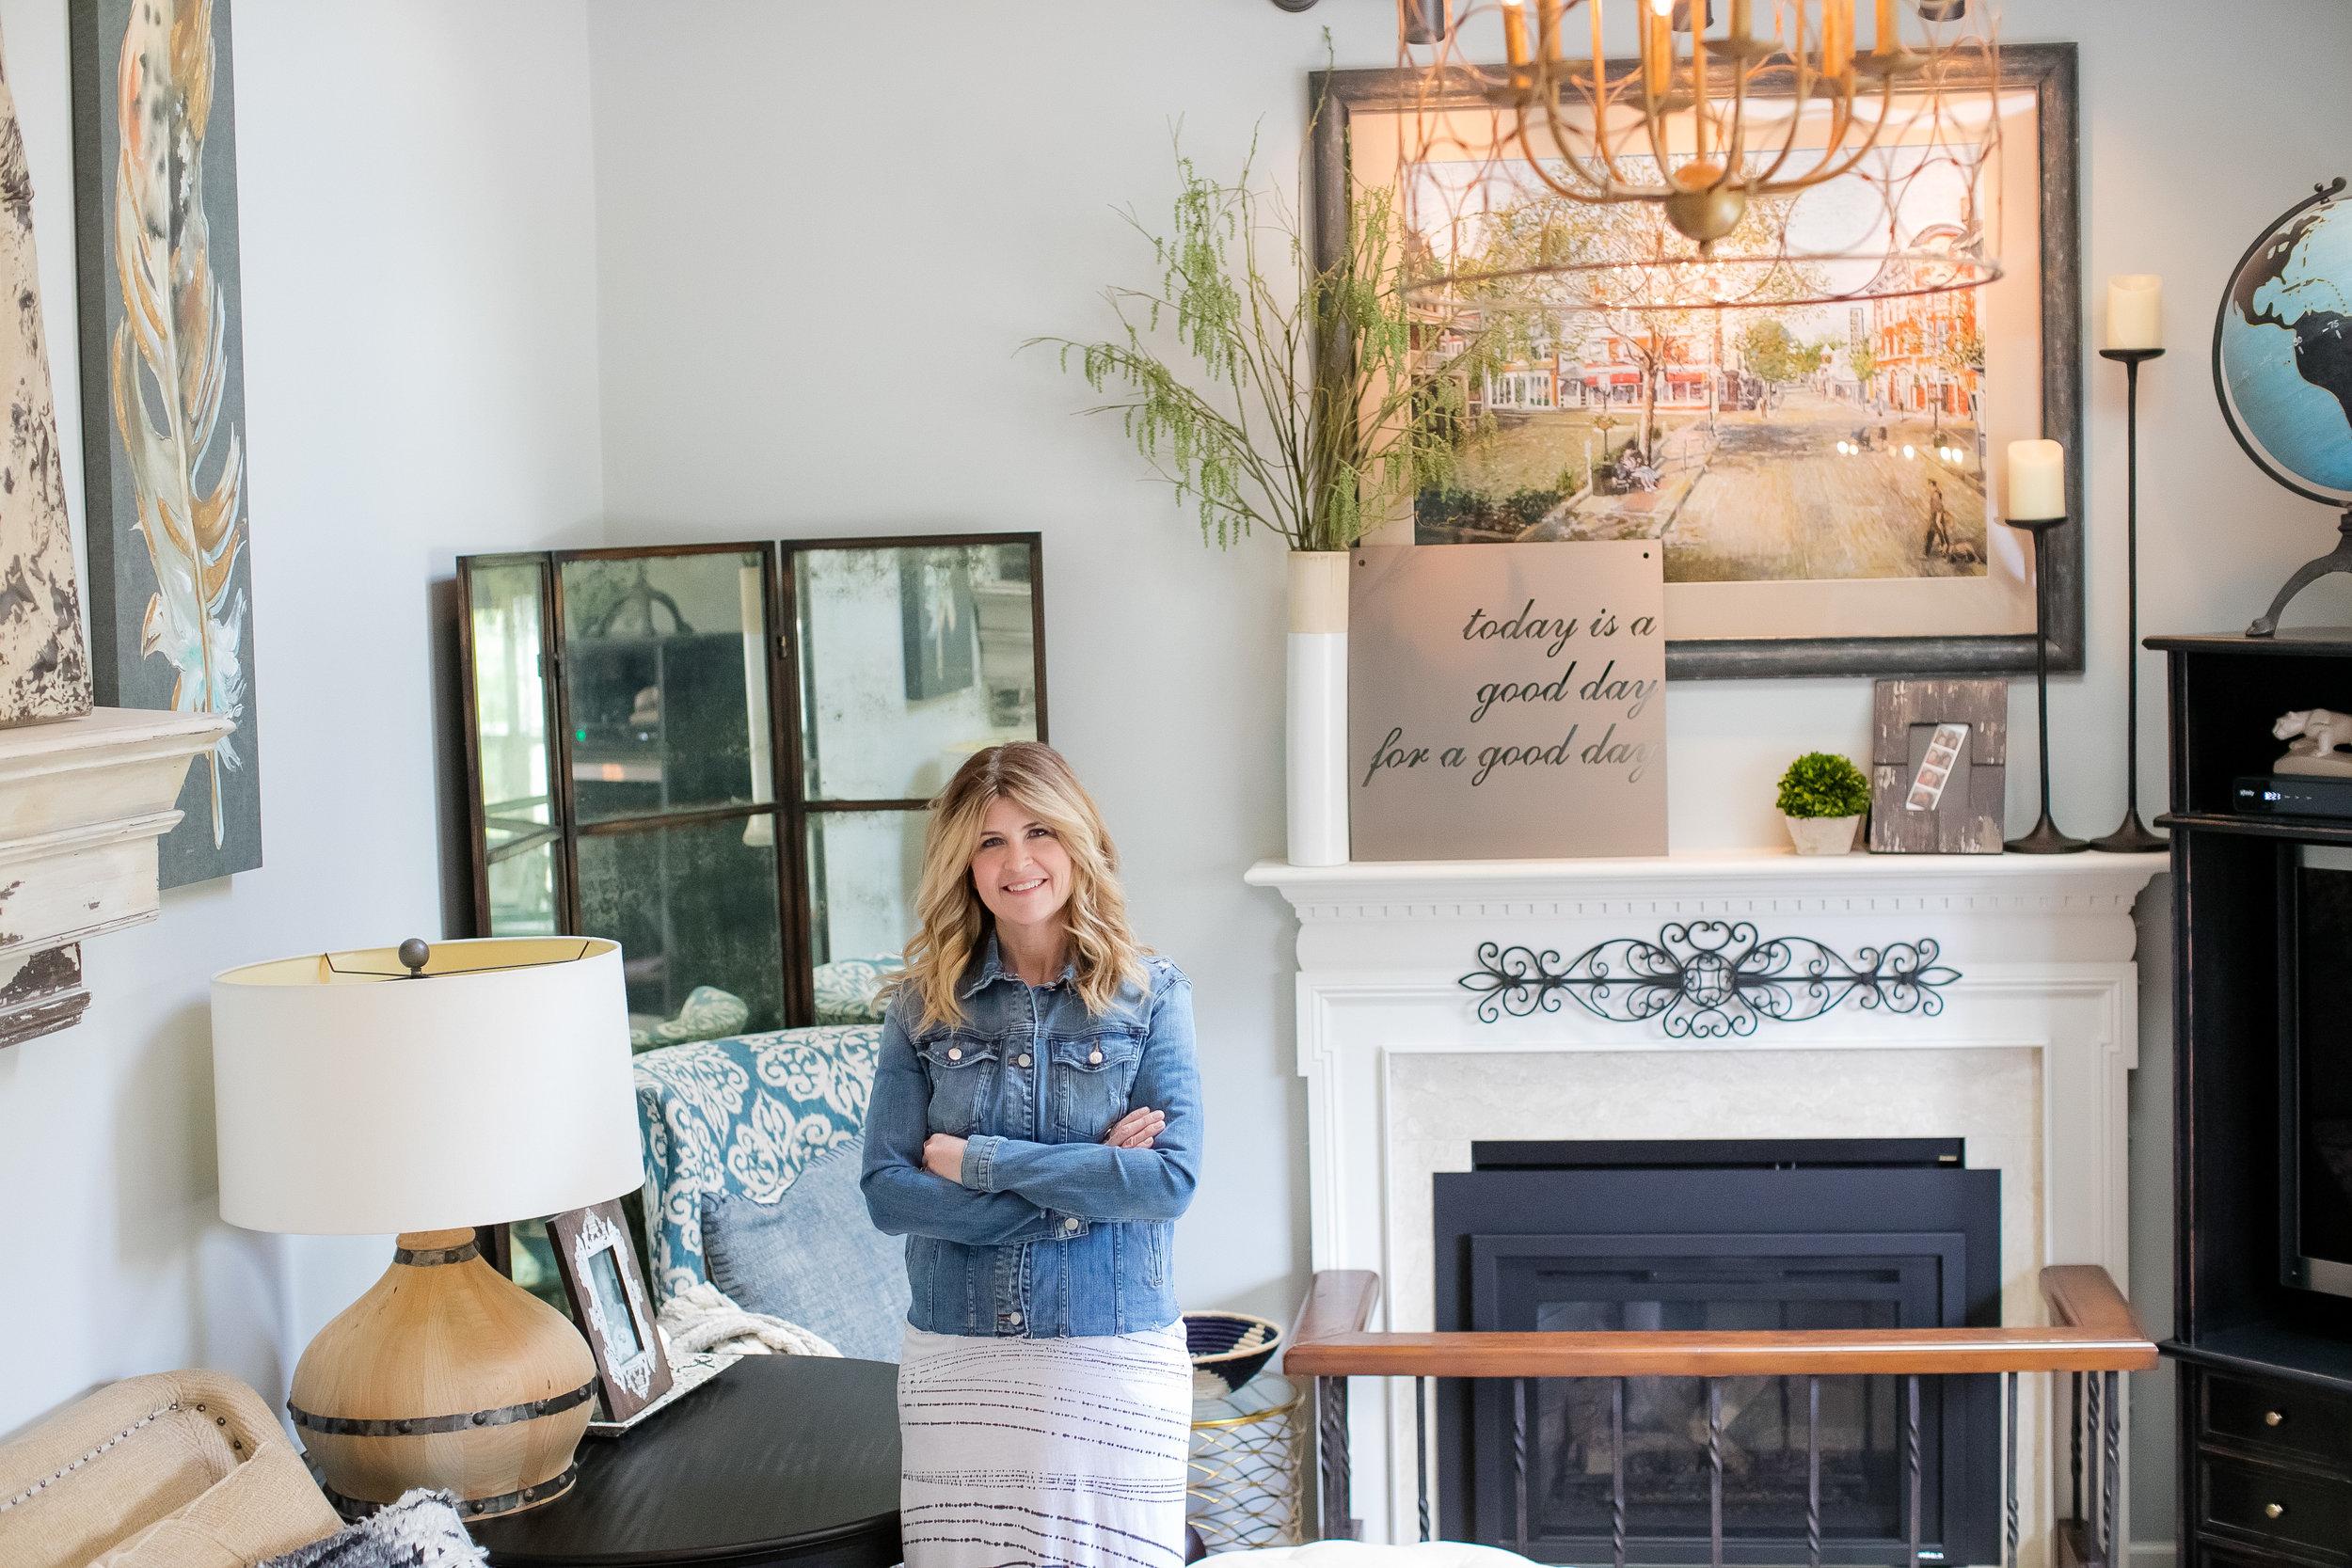 Portrait of Kelley Price in living room